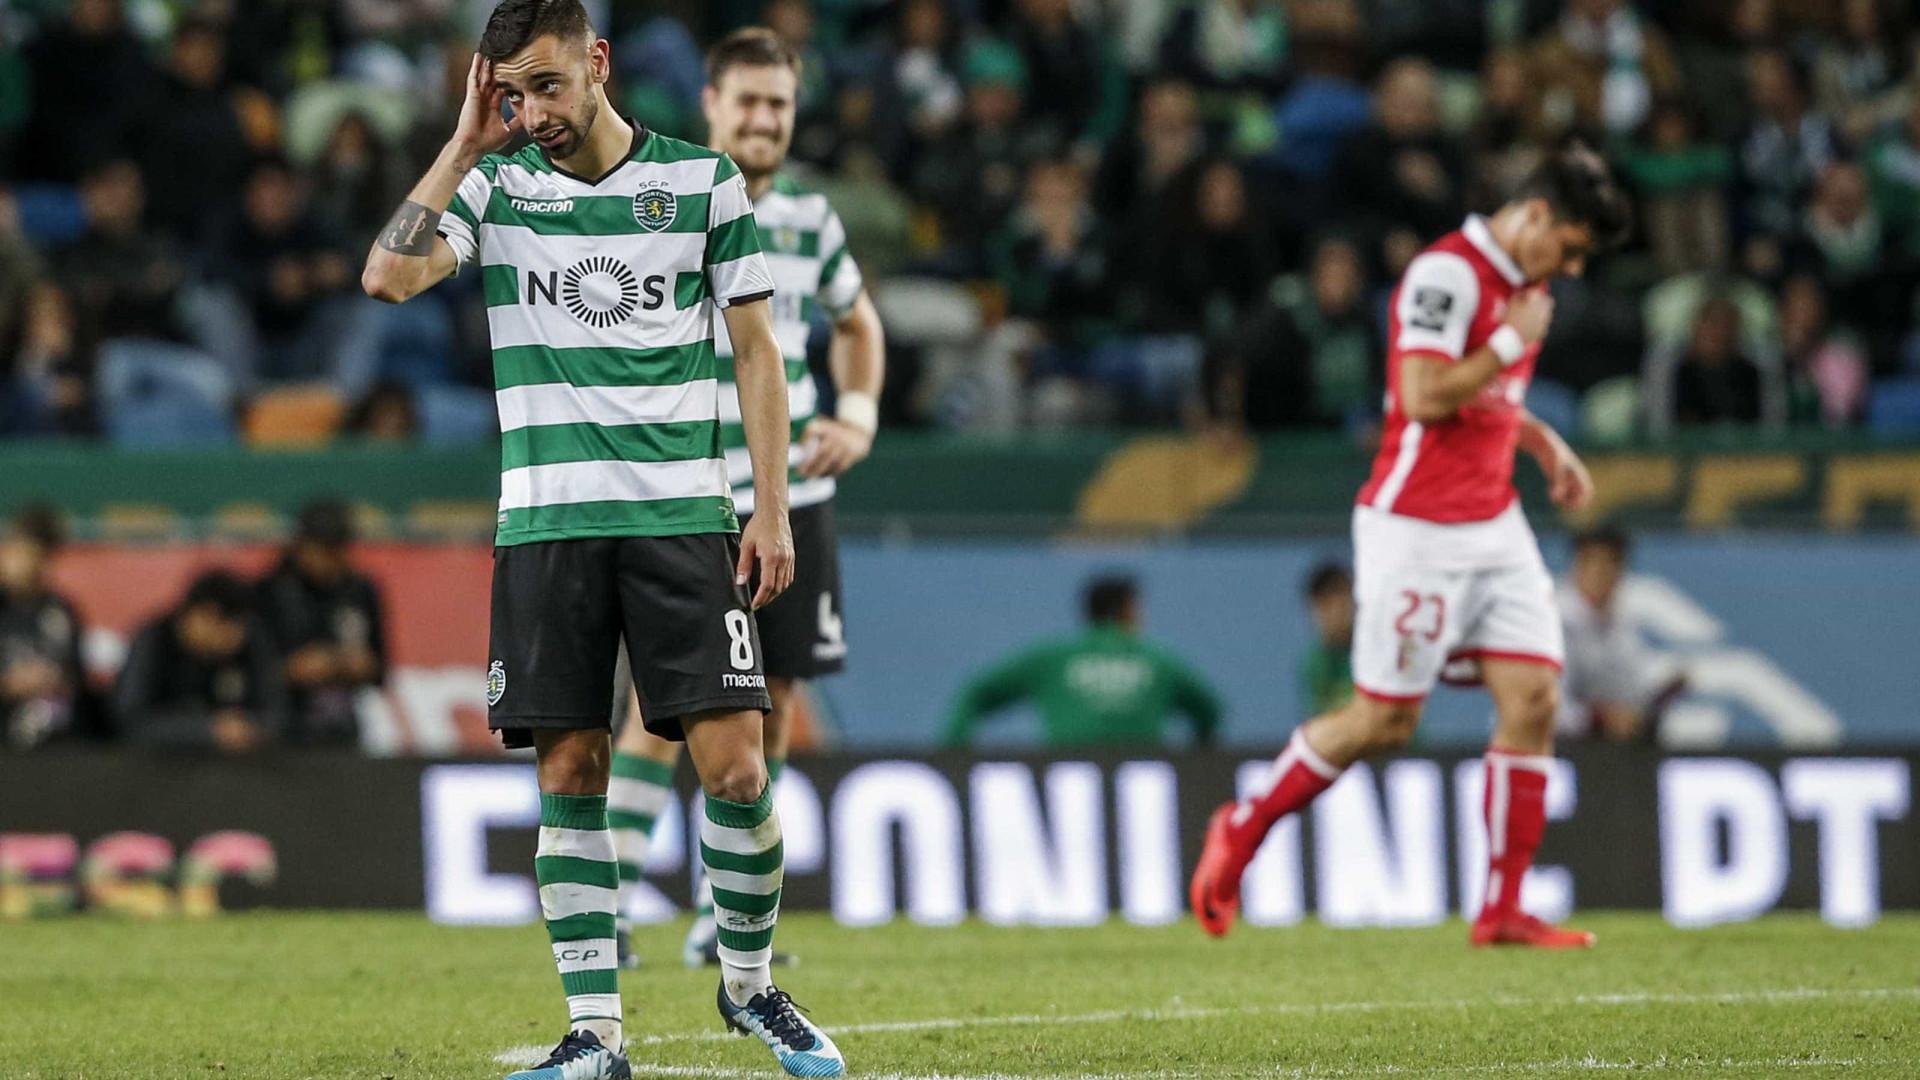 Sporting-Sp. Braga, 2-2 (destaques)